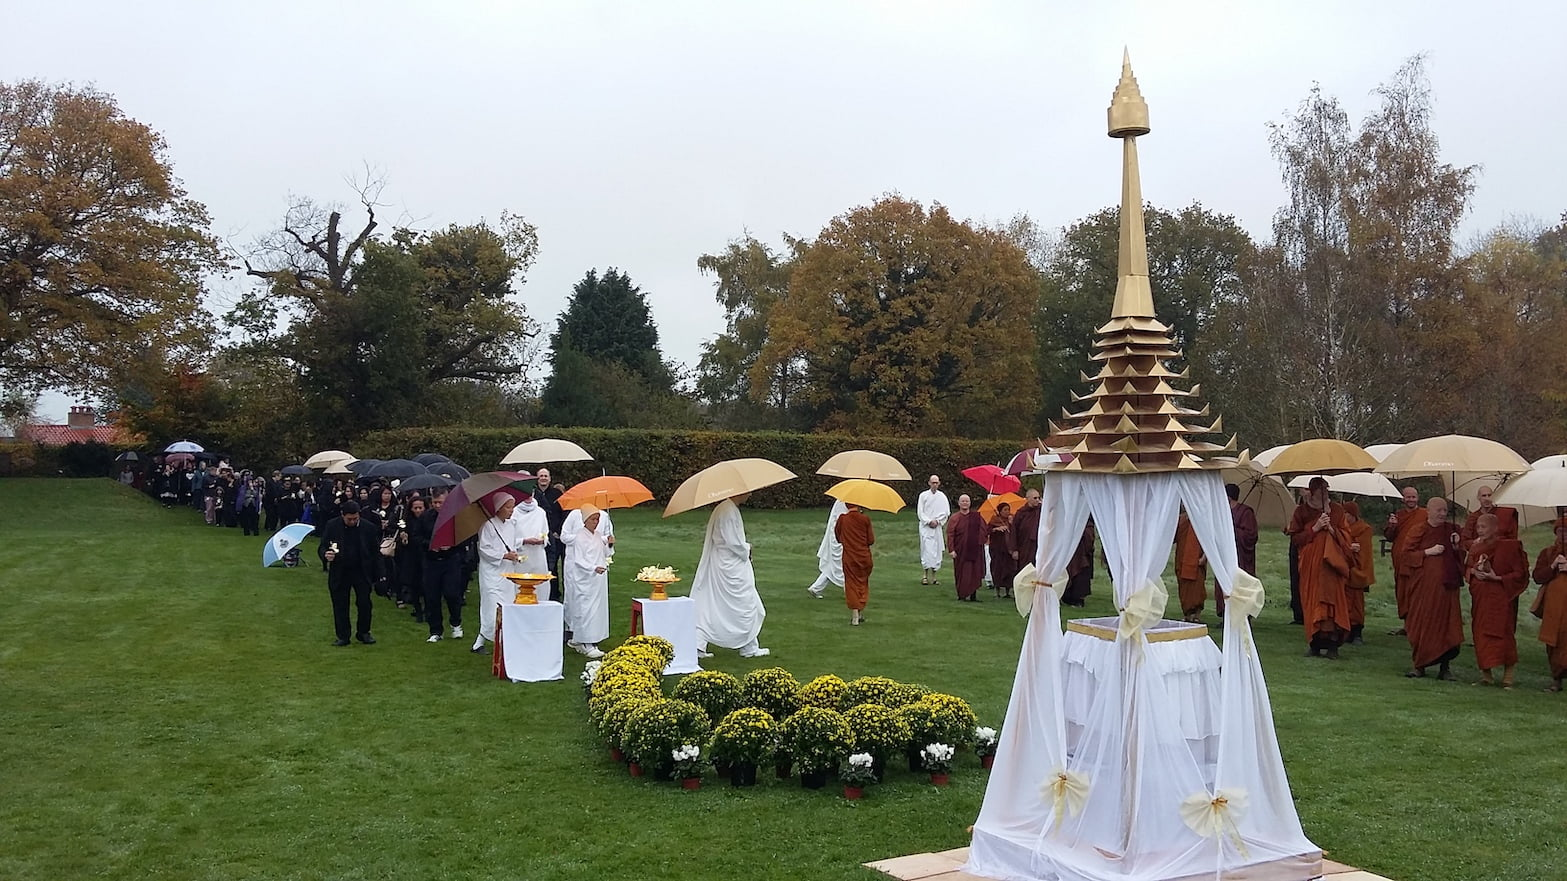 2017.10.26 King Maha IX's funeral